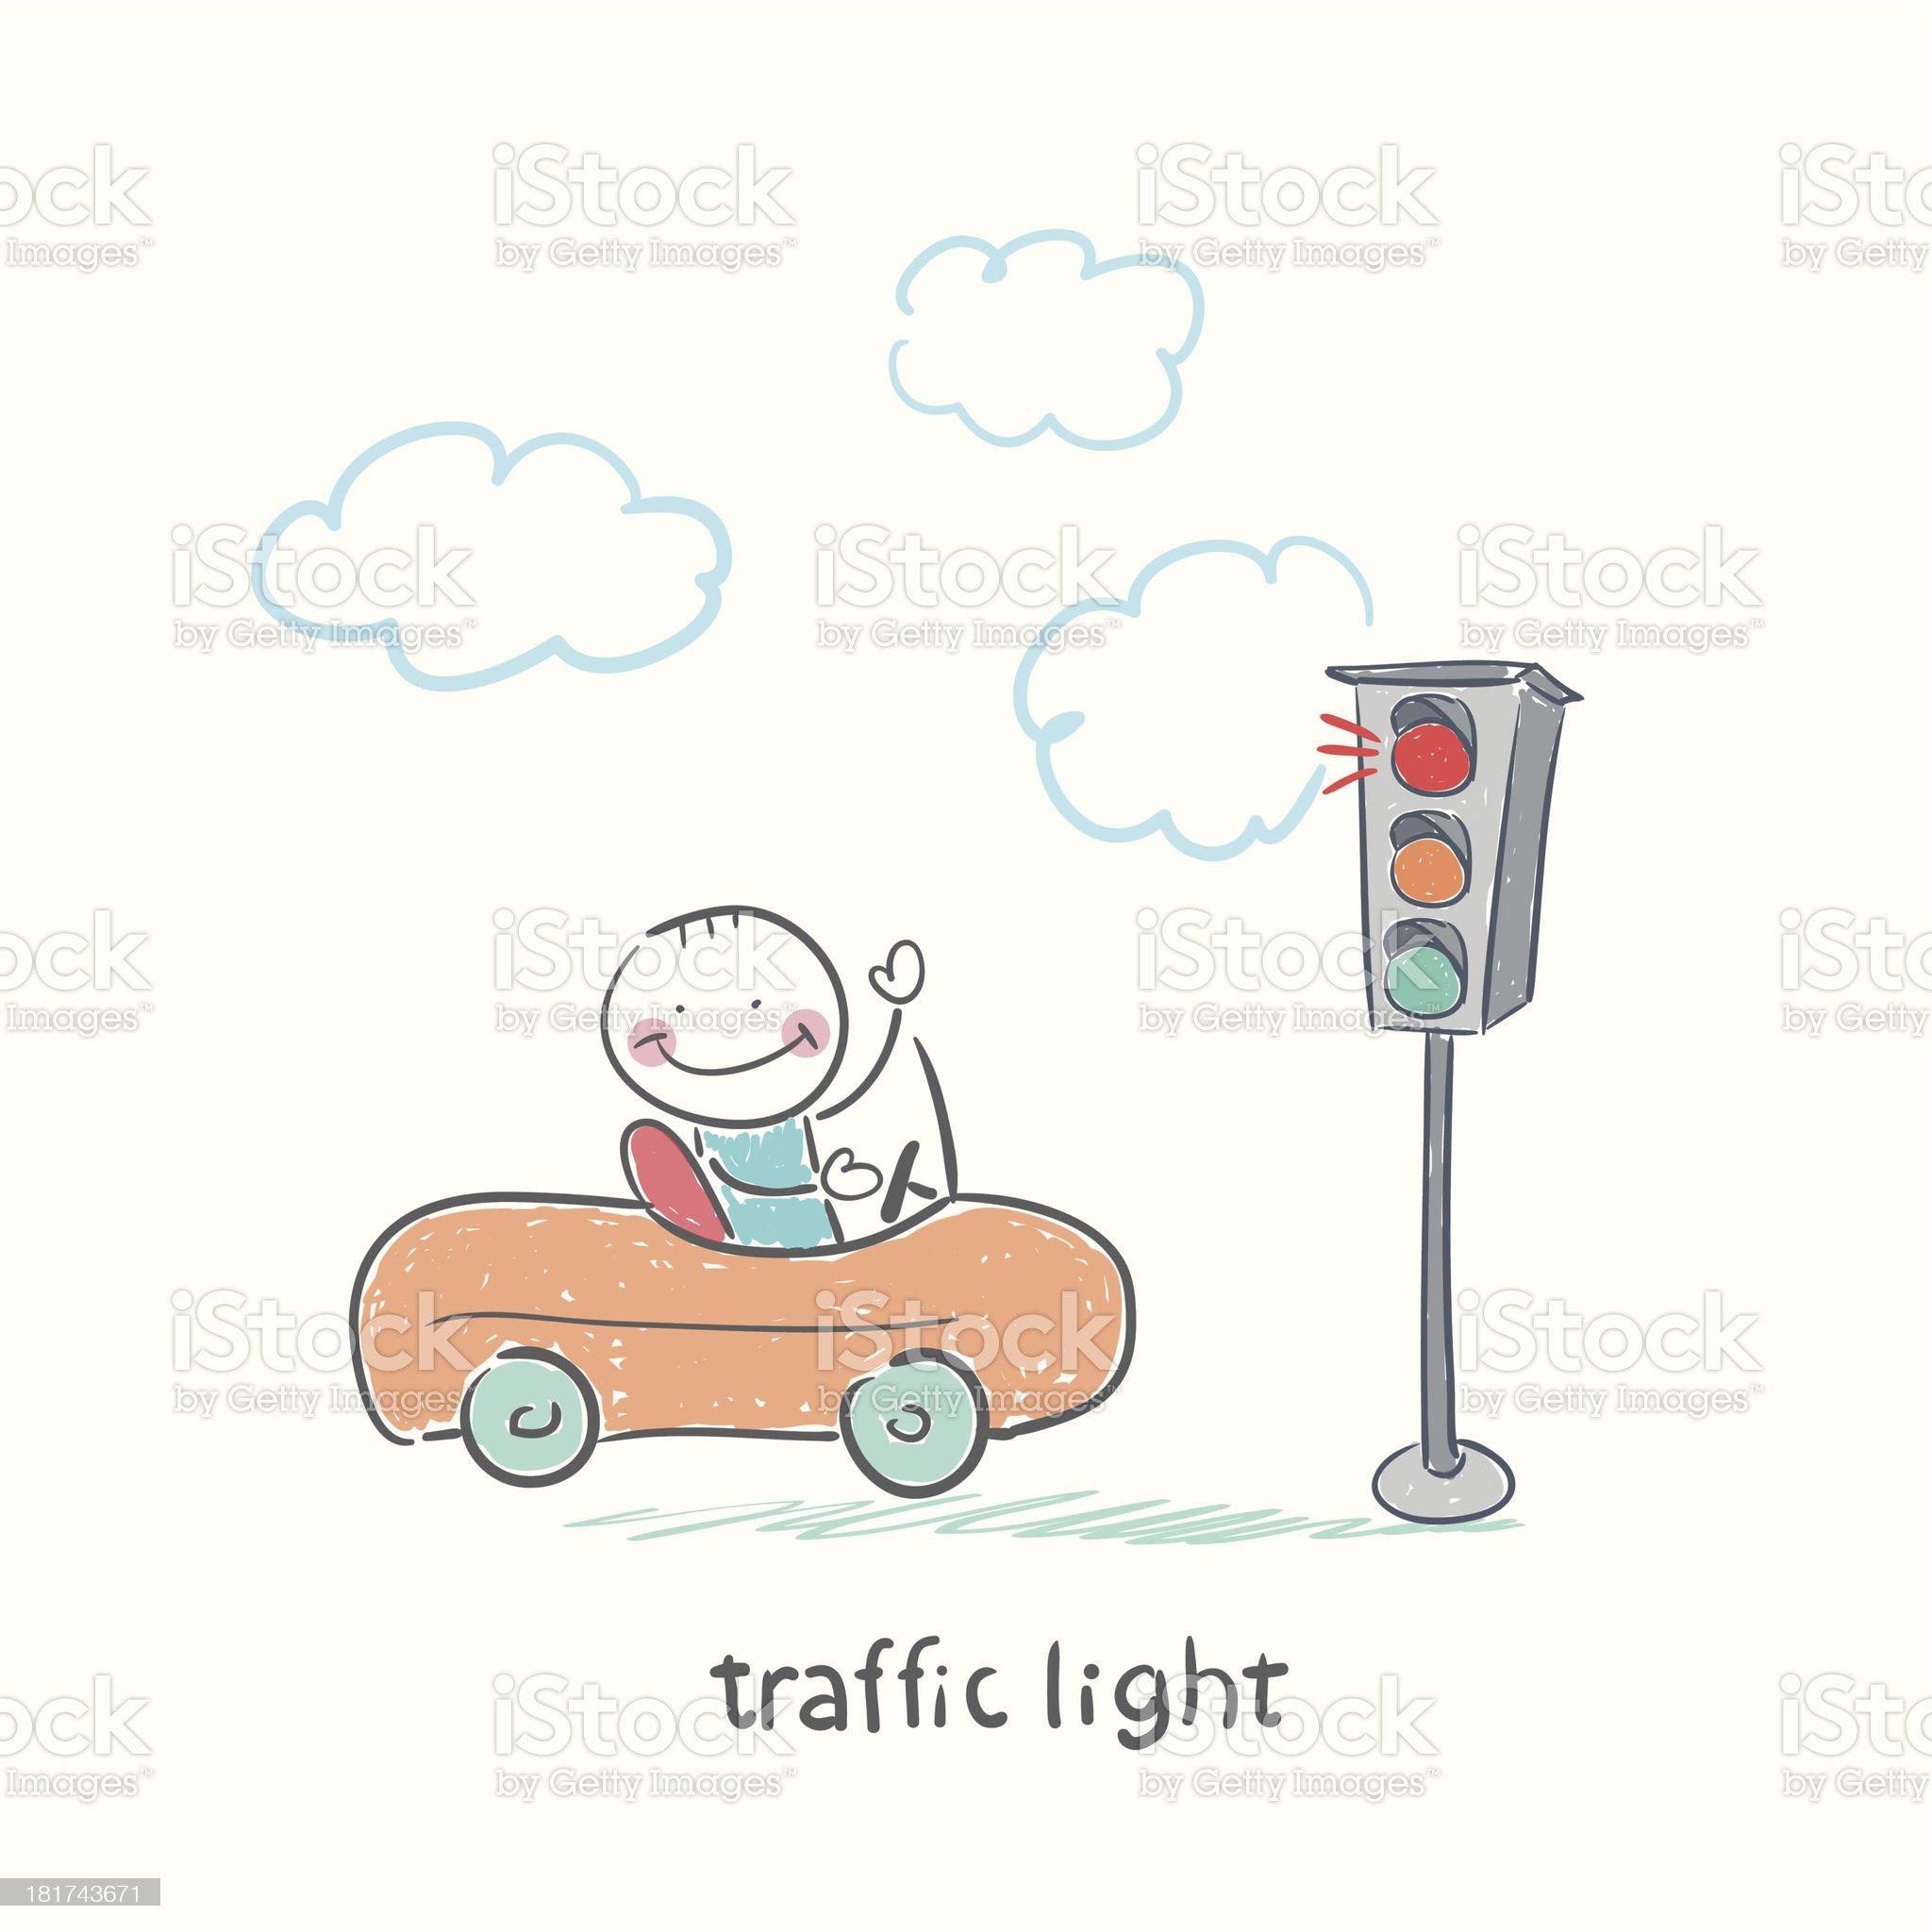 traffic light royalty-free stock vector art